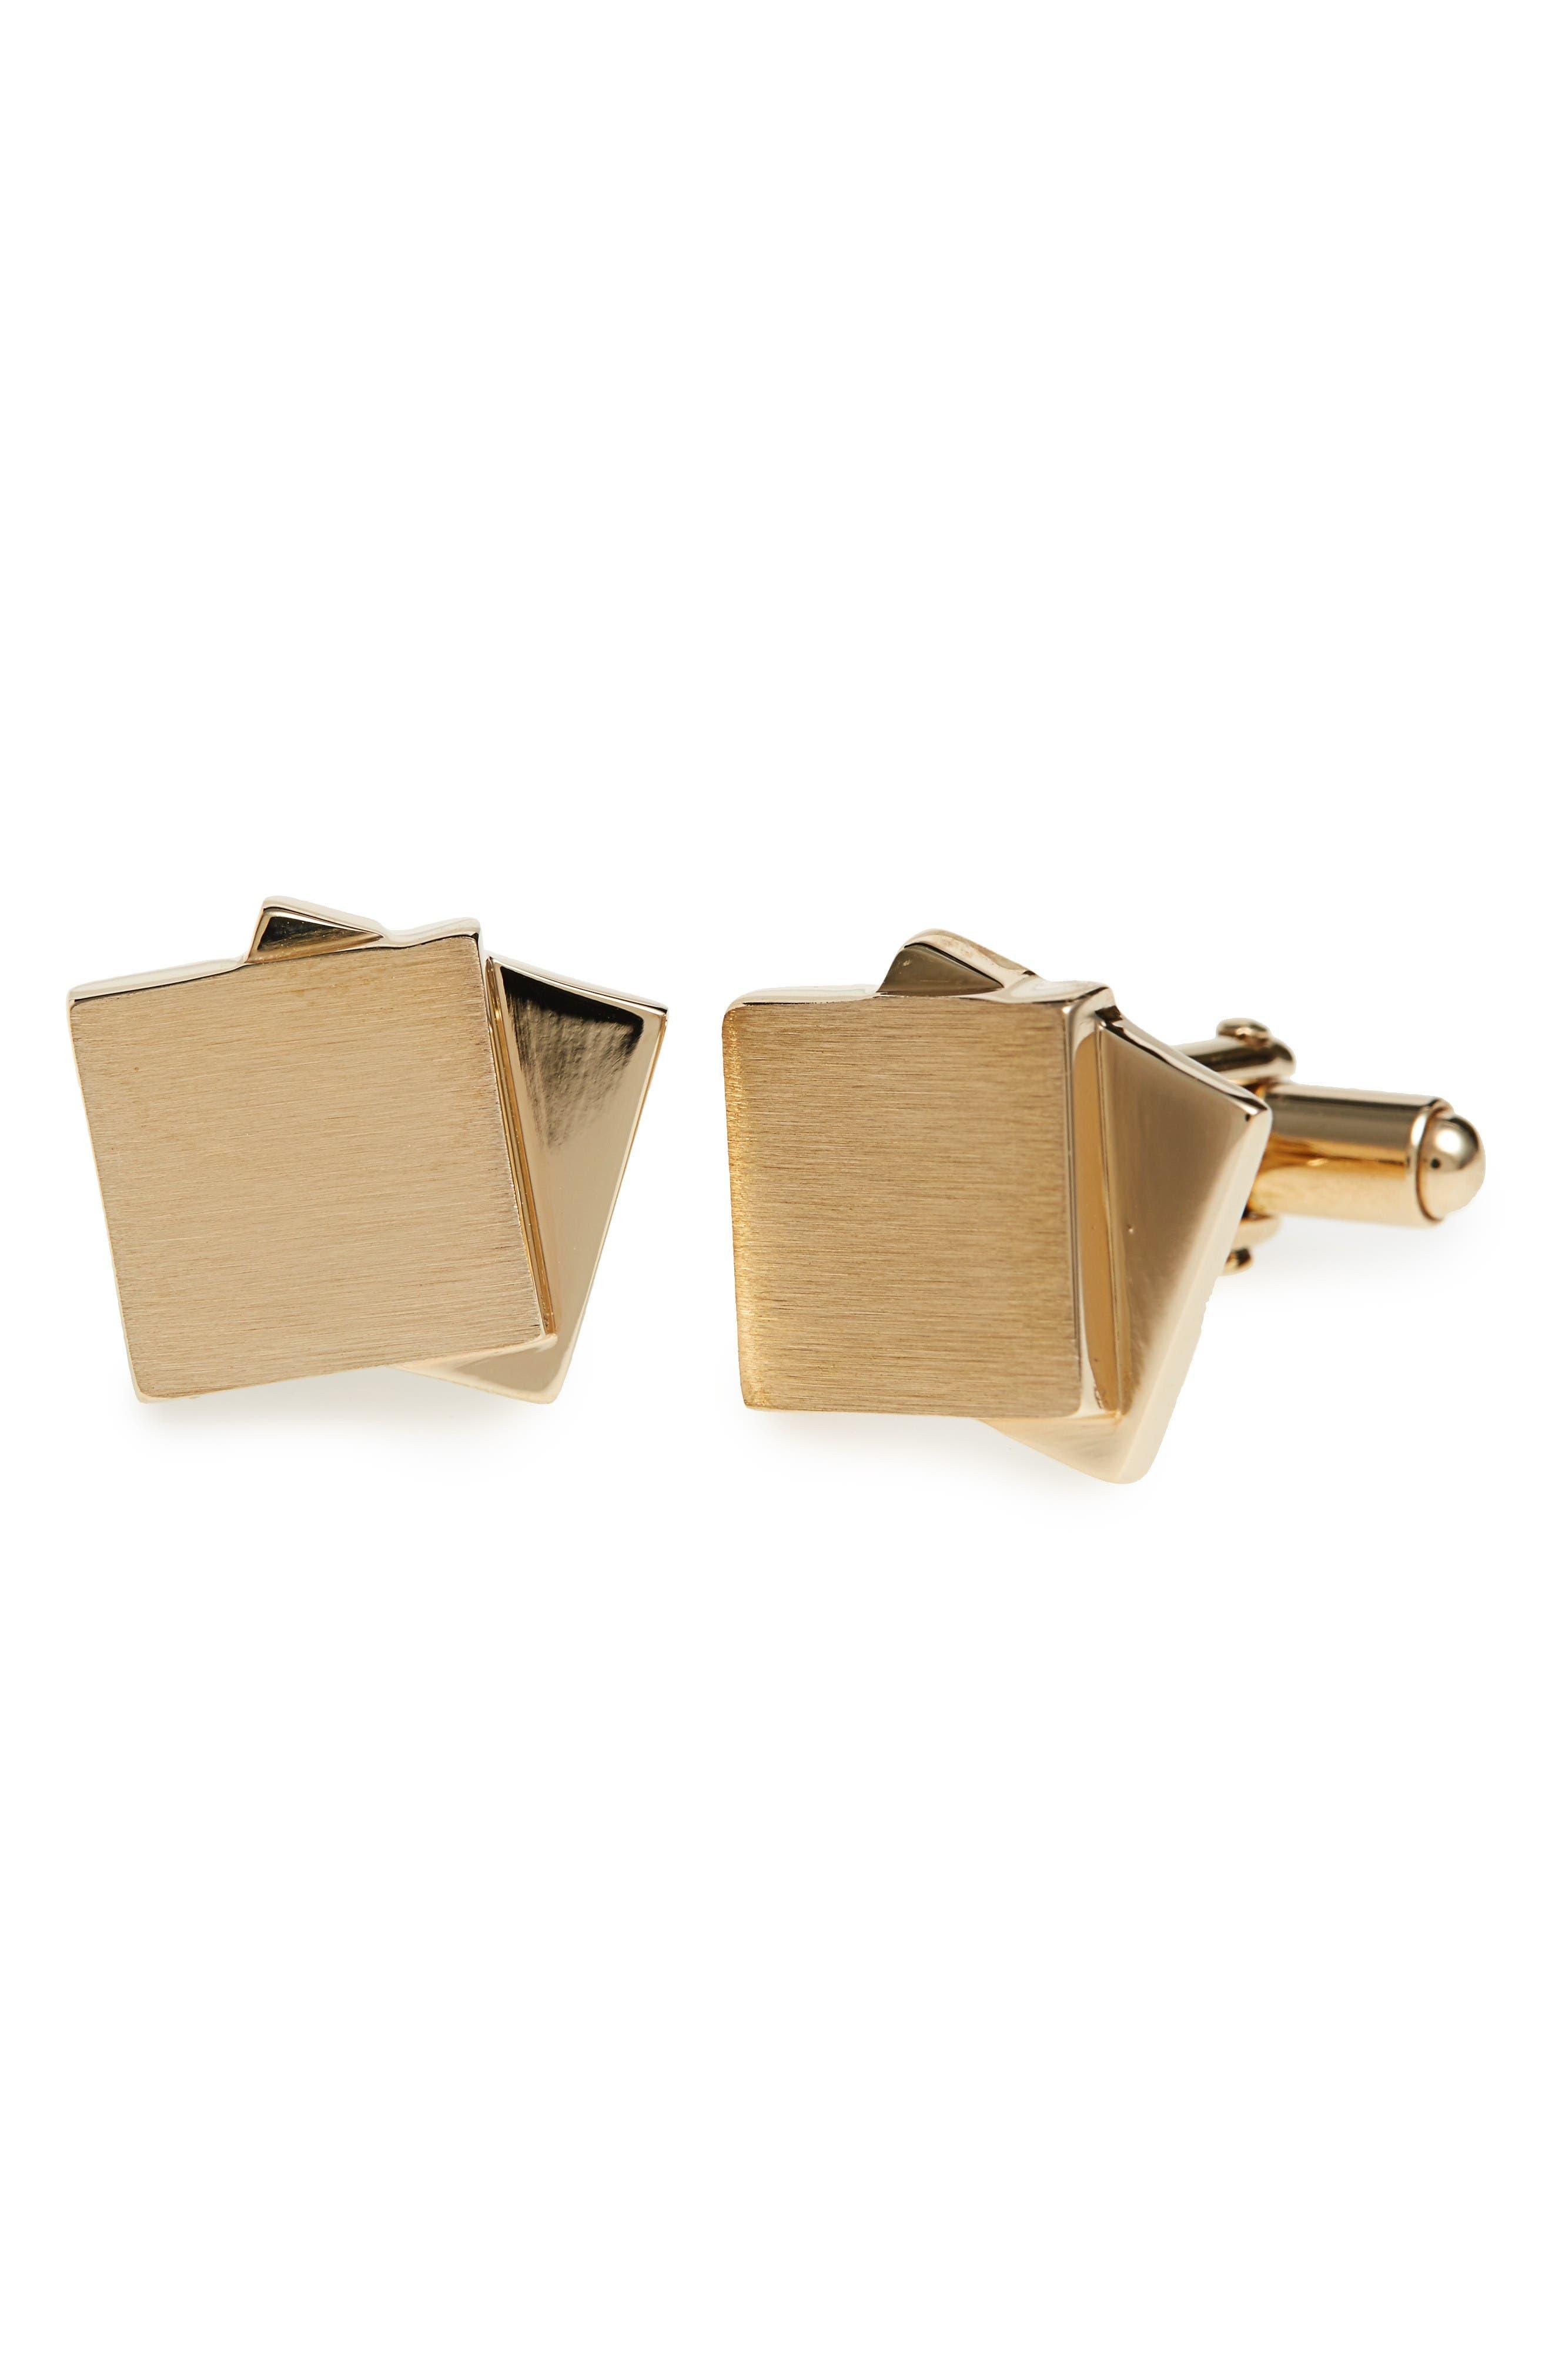 Lanvin Dual Plaques Cuff Links